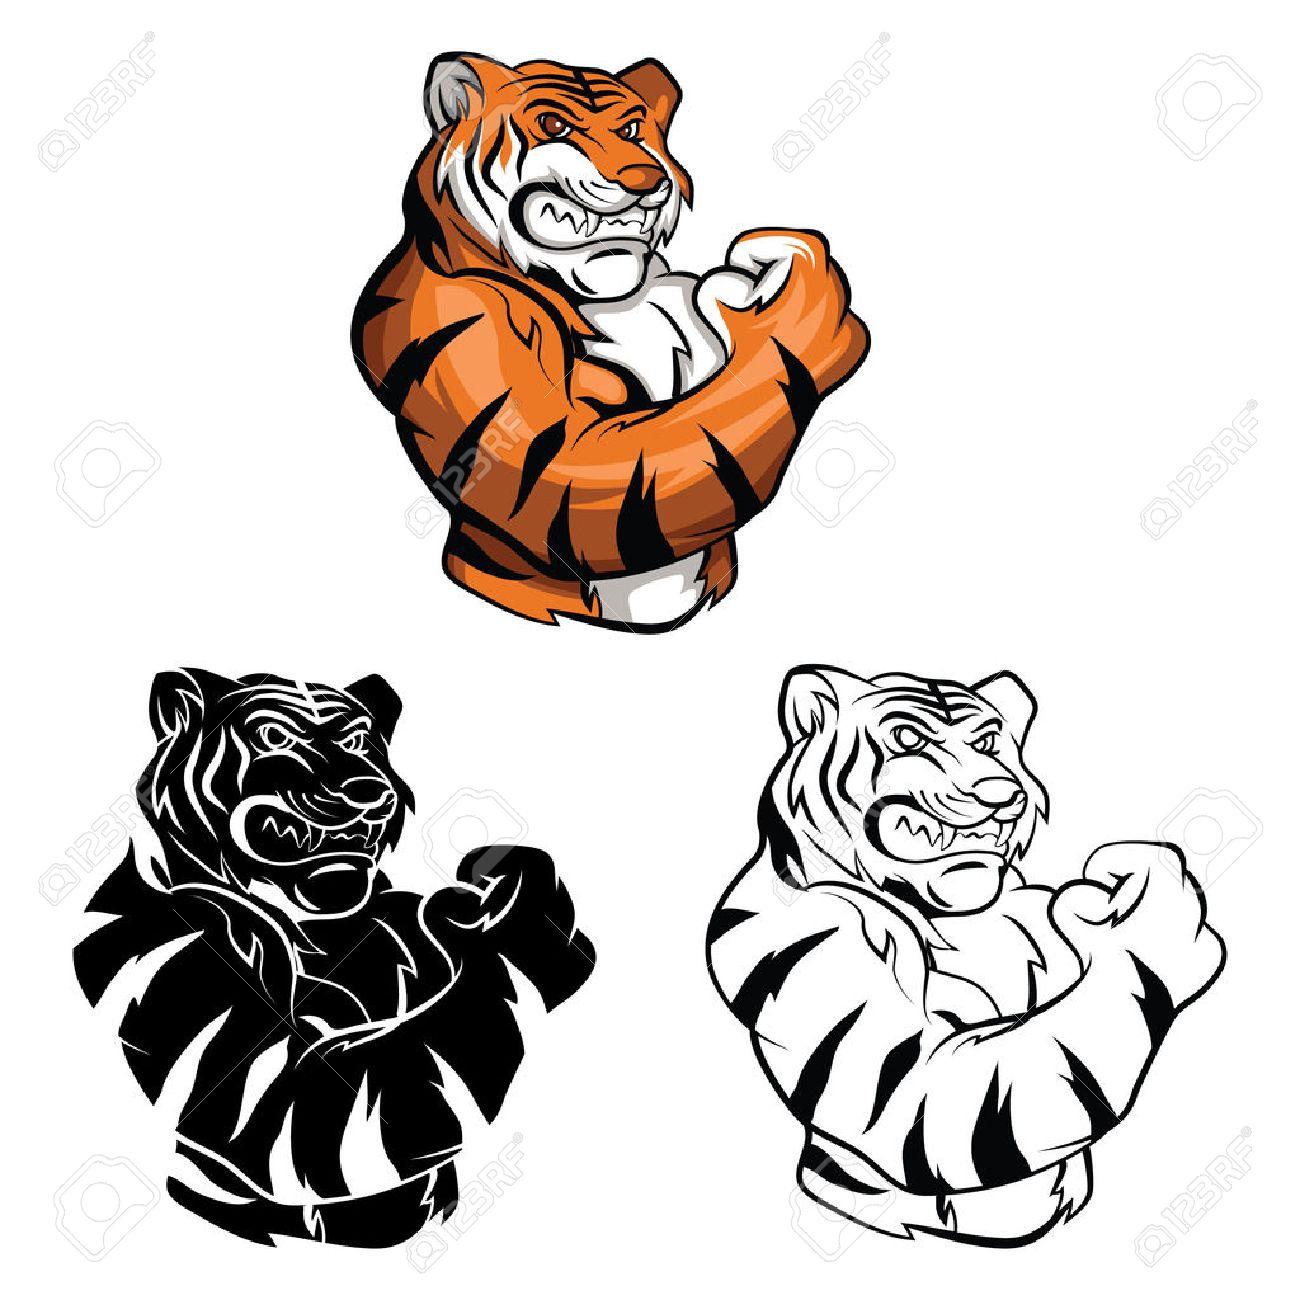 Coloring book Tiger Mascot cartoon character - 37576982